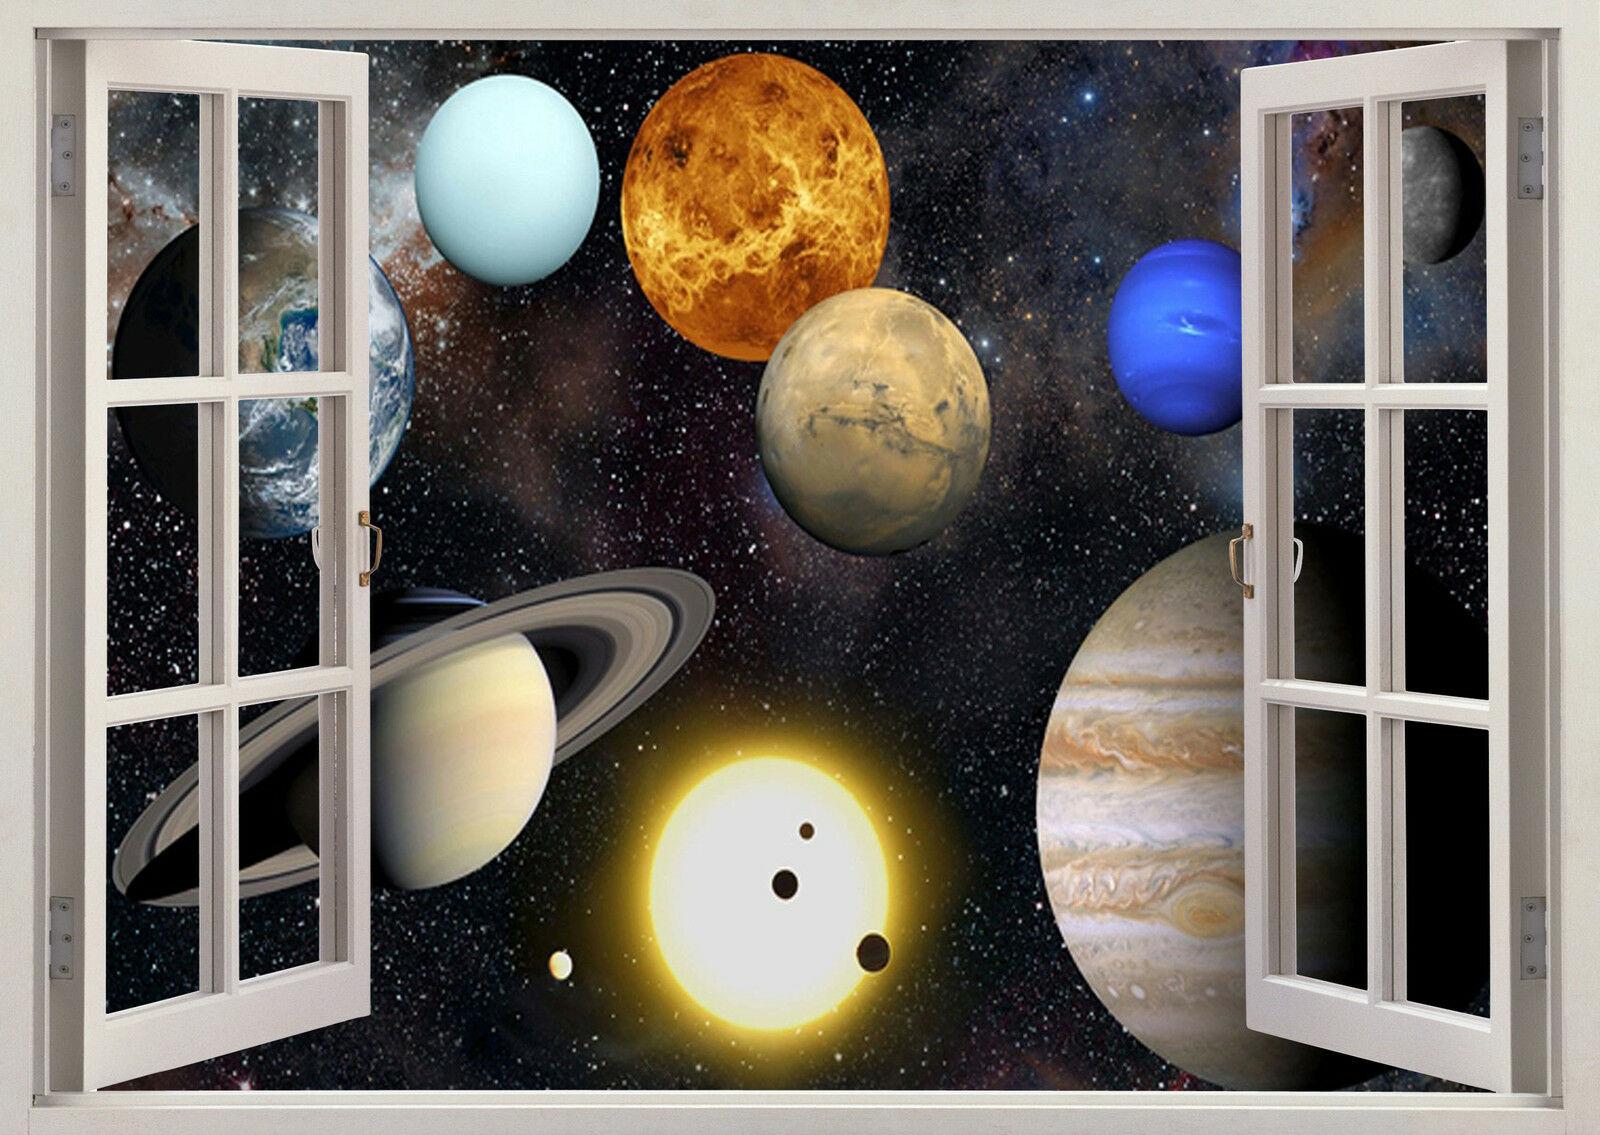 Planets Solar System Galaxy Window Art Film Print Silk Poster Home Wall Decor 24x36inch